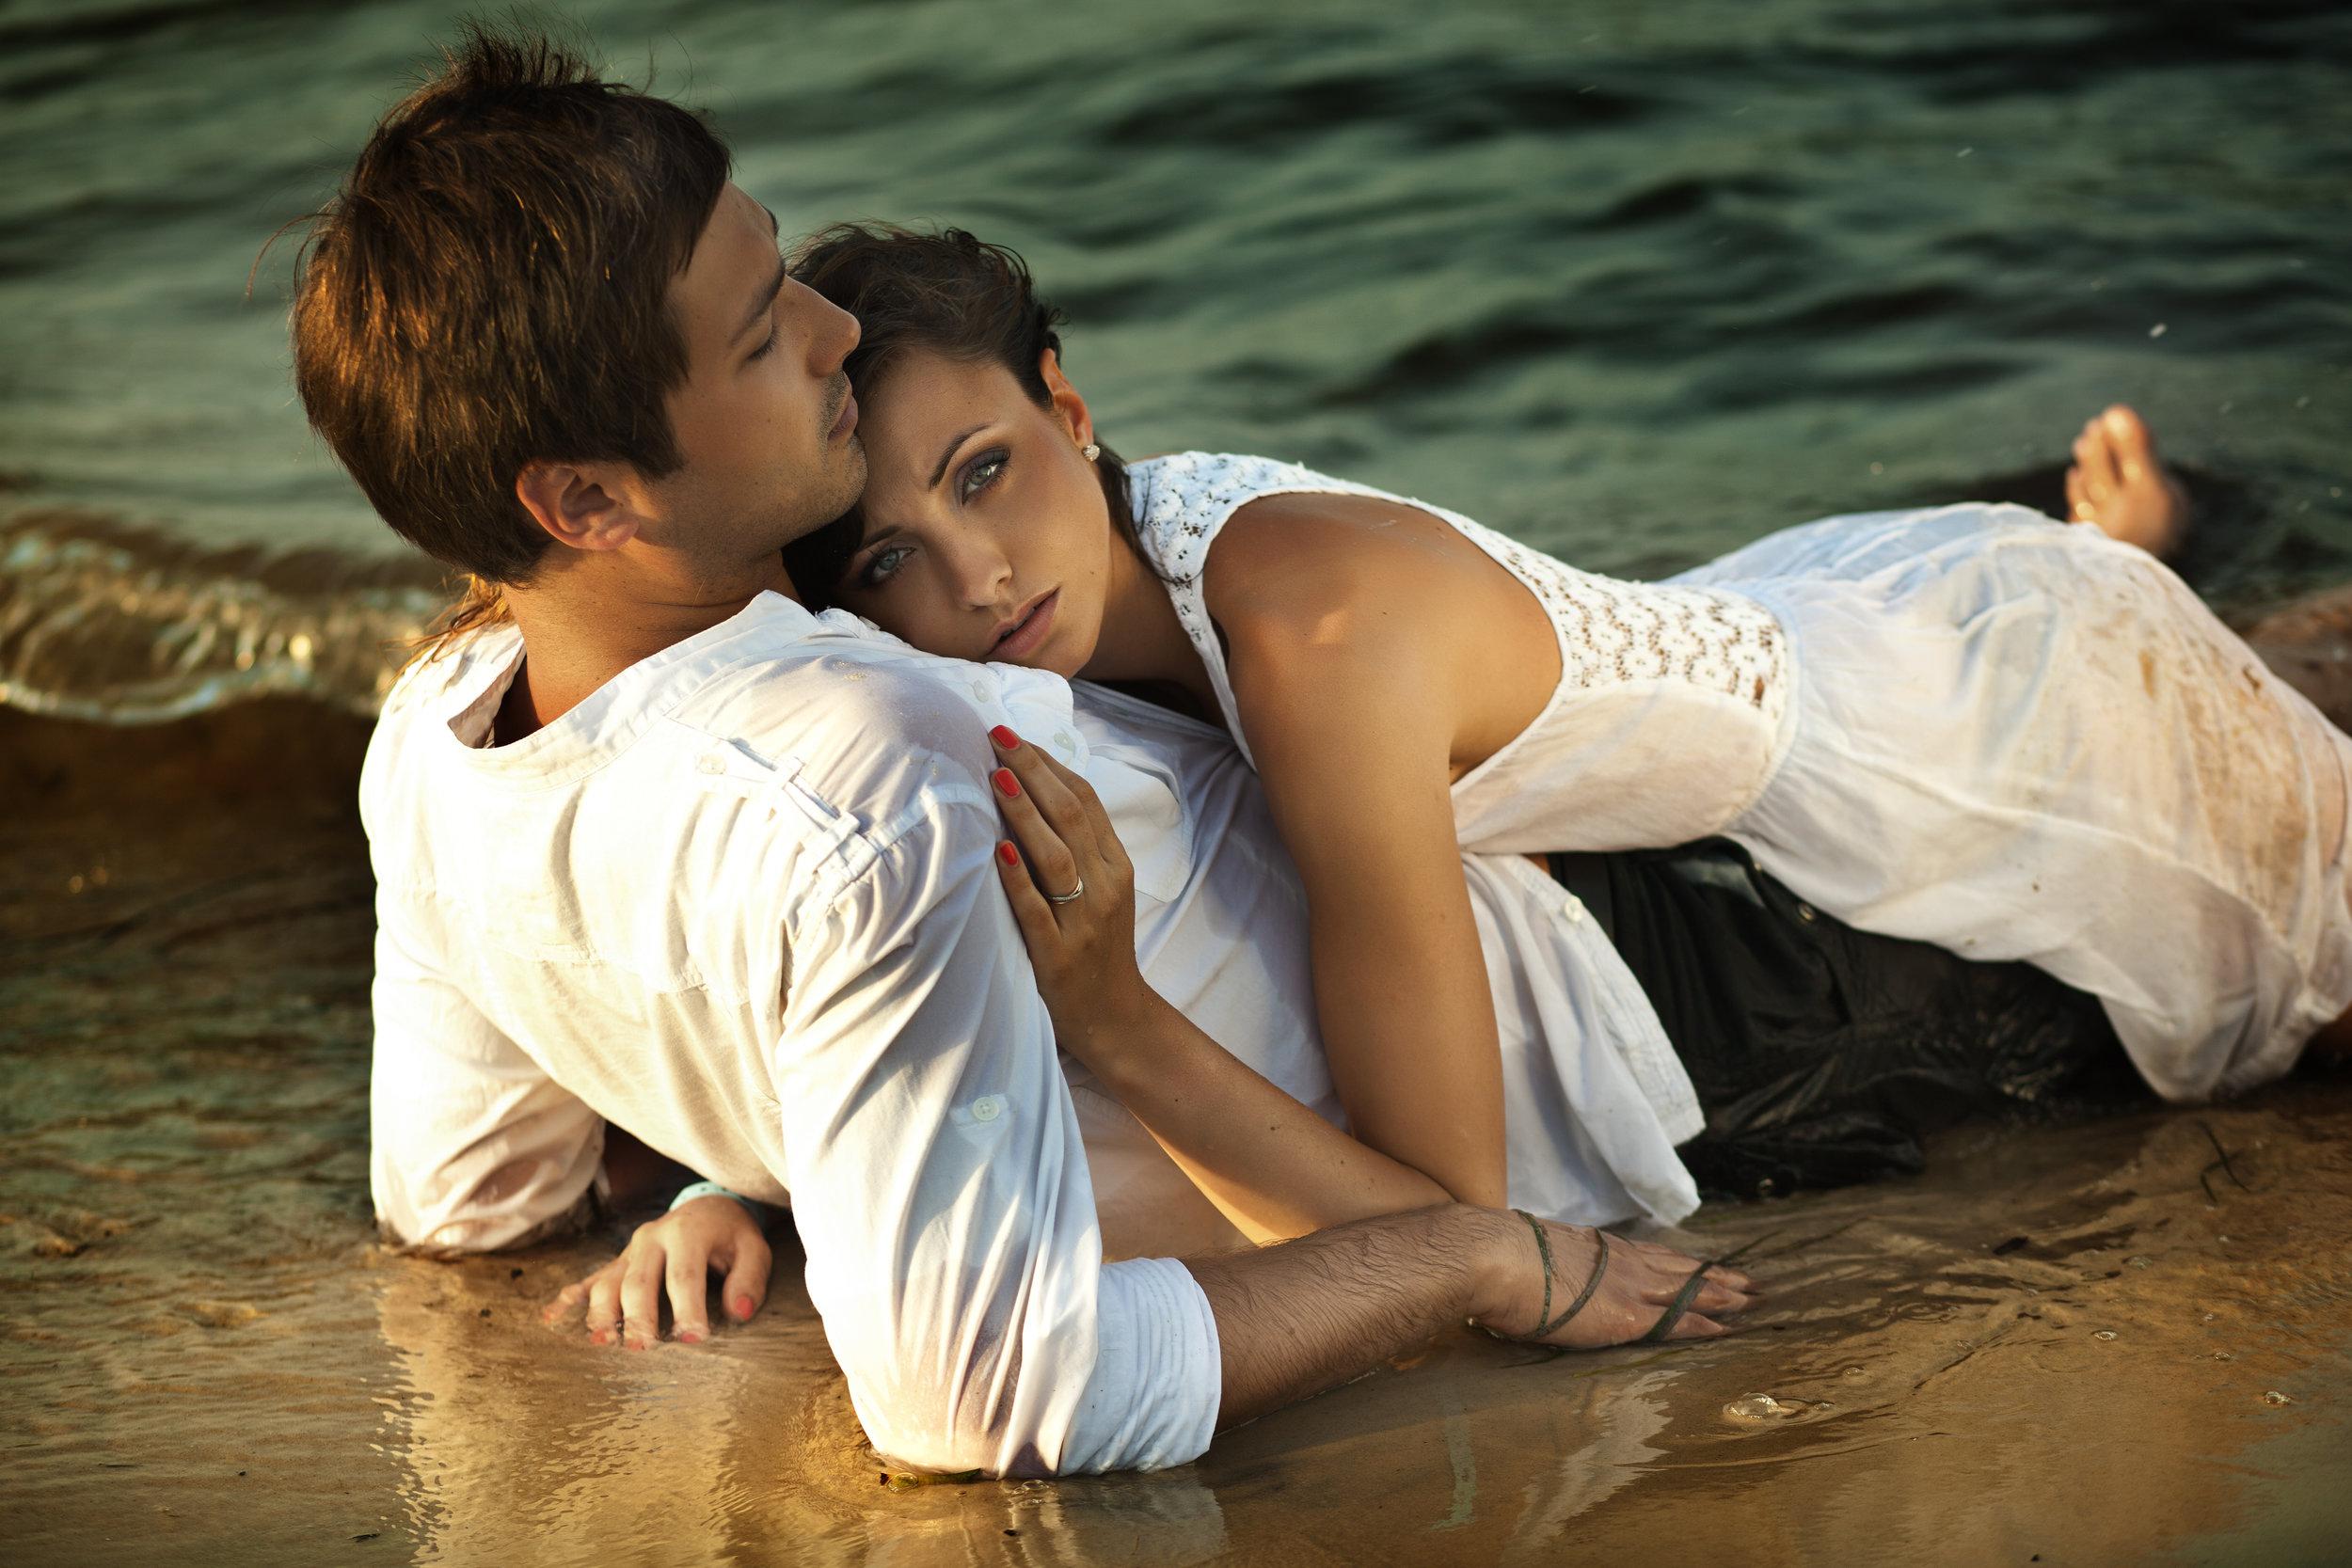 man-and-woman-on-beach.jpg